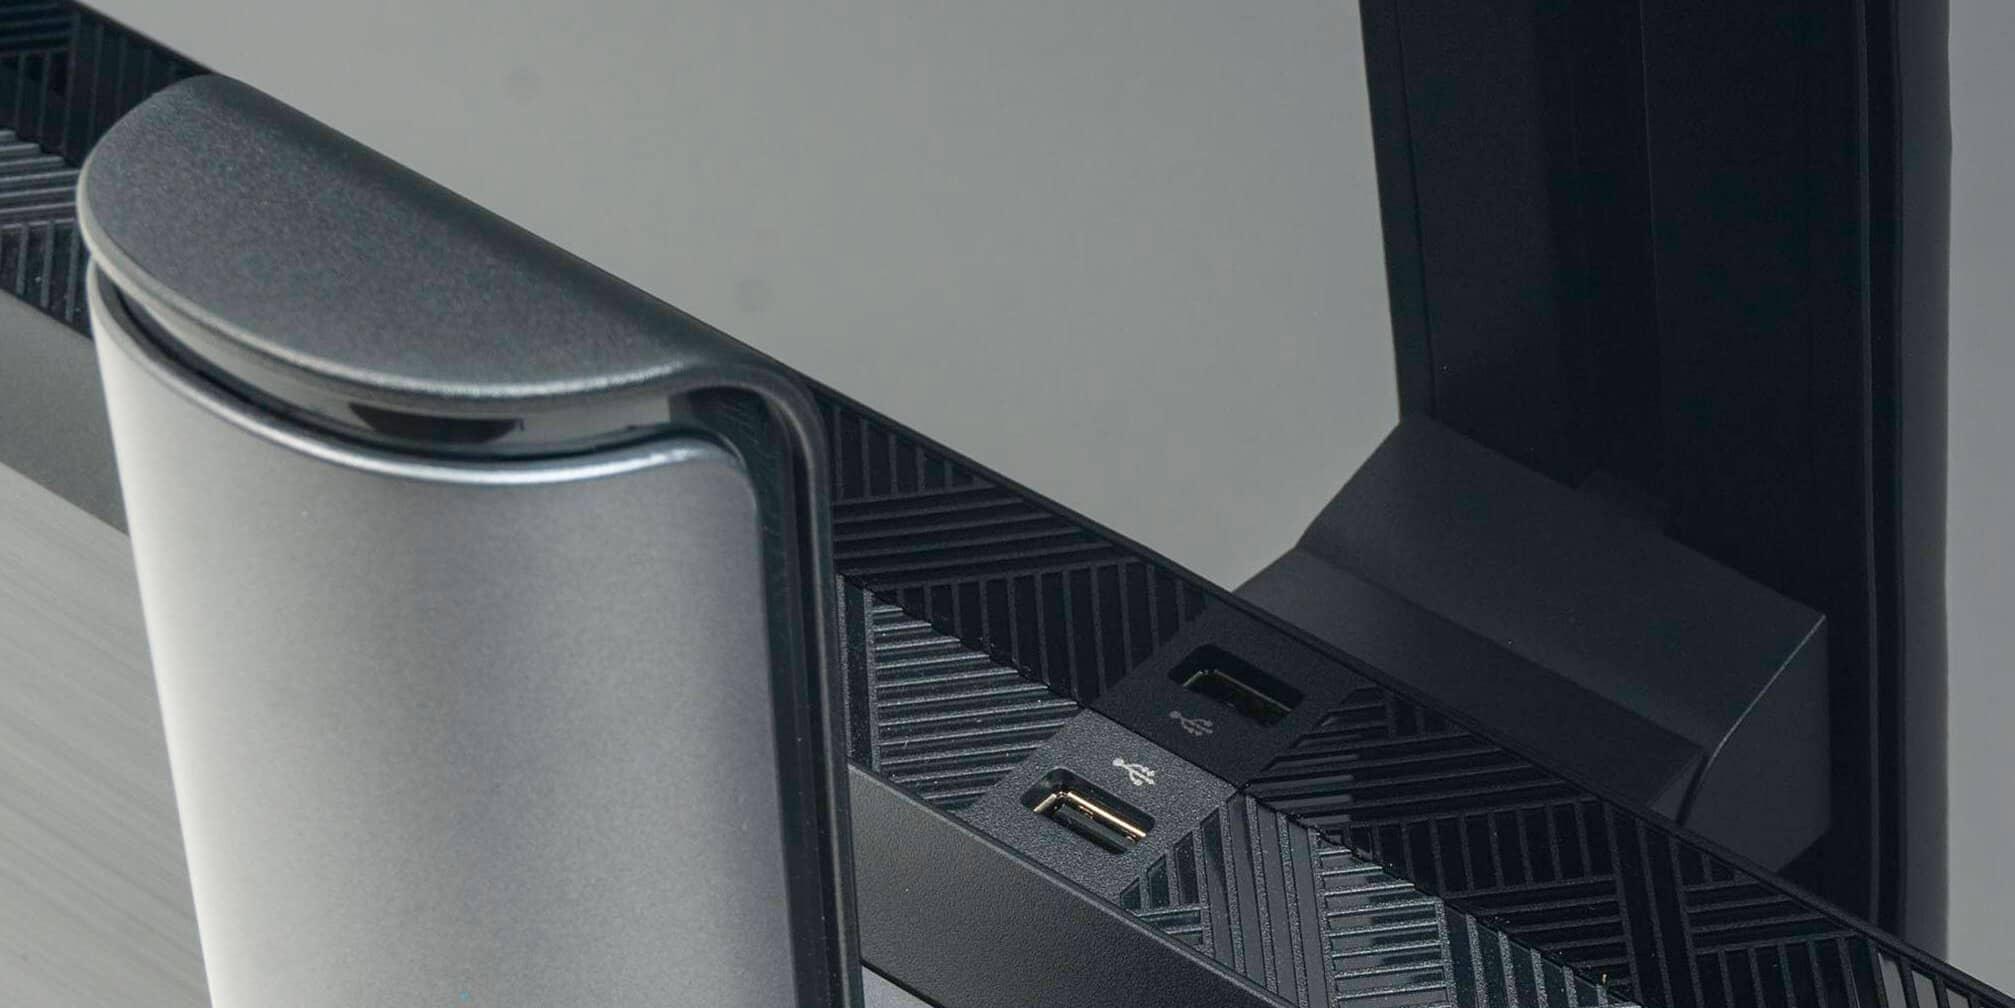 MSI Modern AM271p: все в одном компьютере